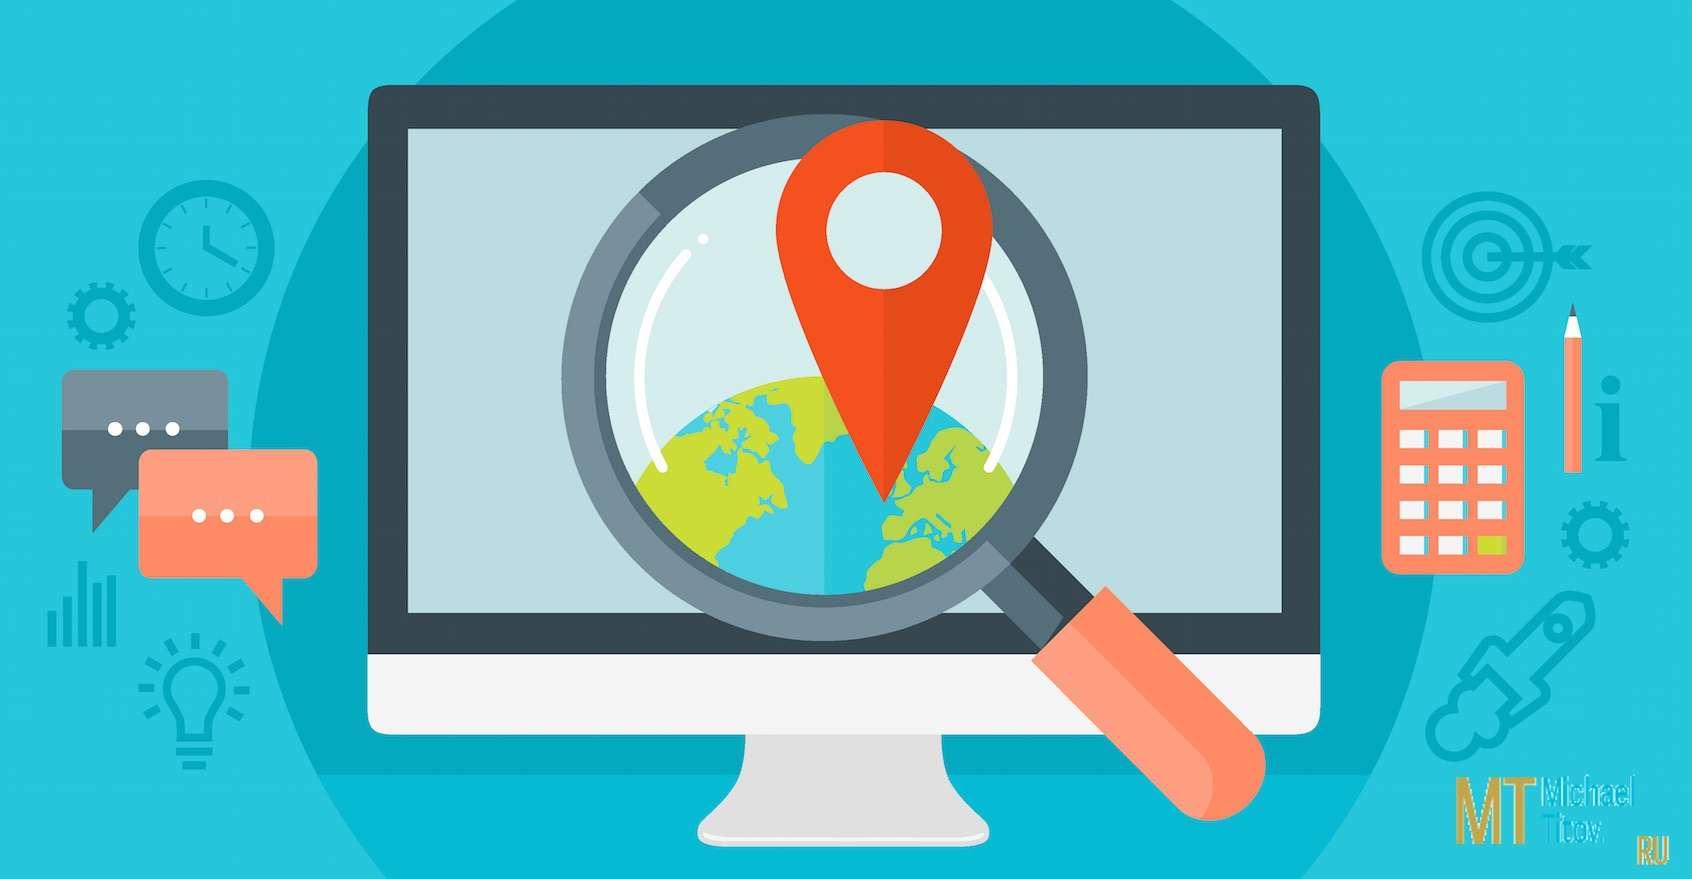 Интернет-маркетинг и SEO: 5 вебинаров, которые помогут новичку